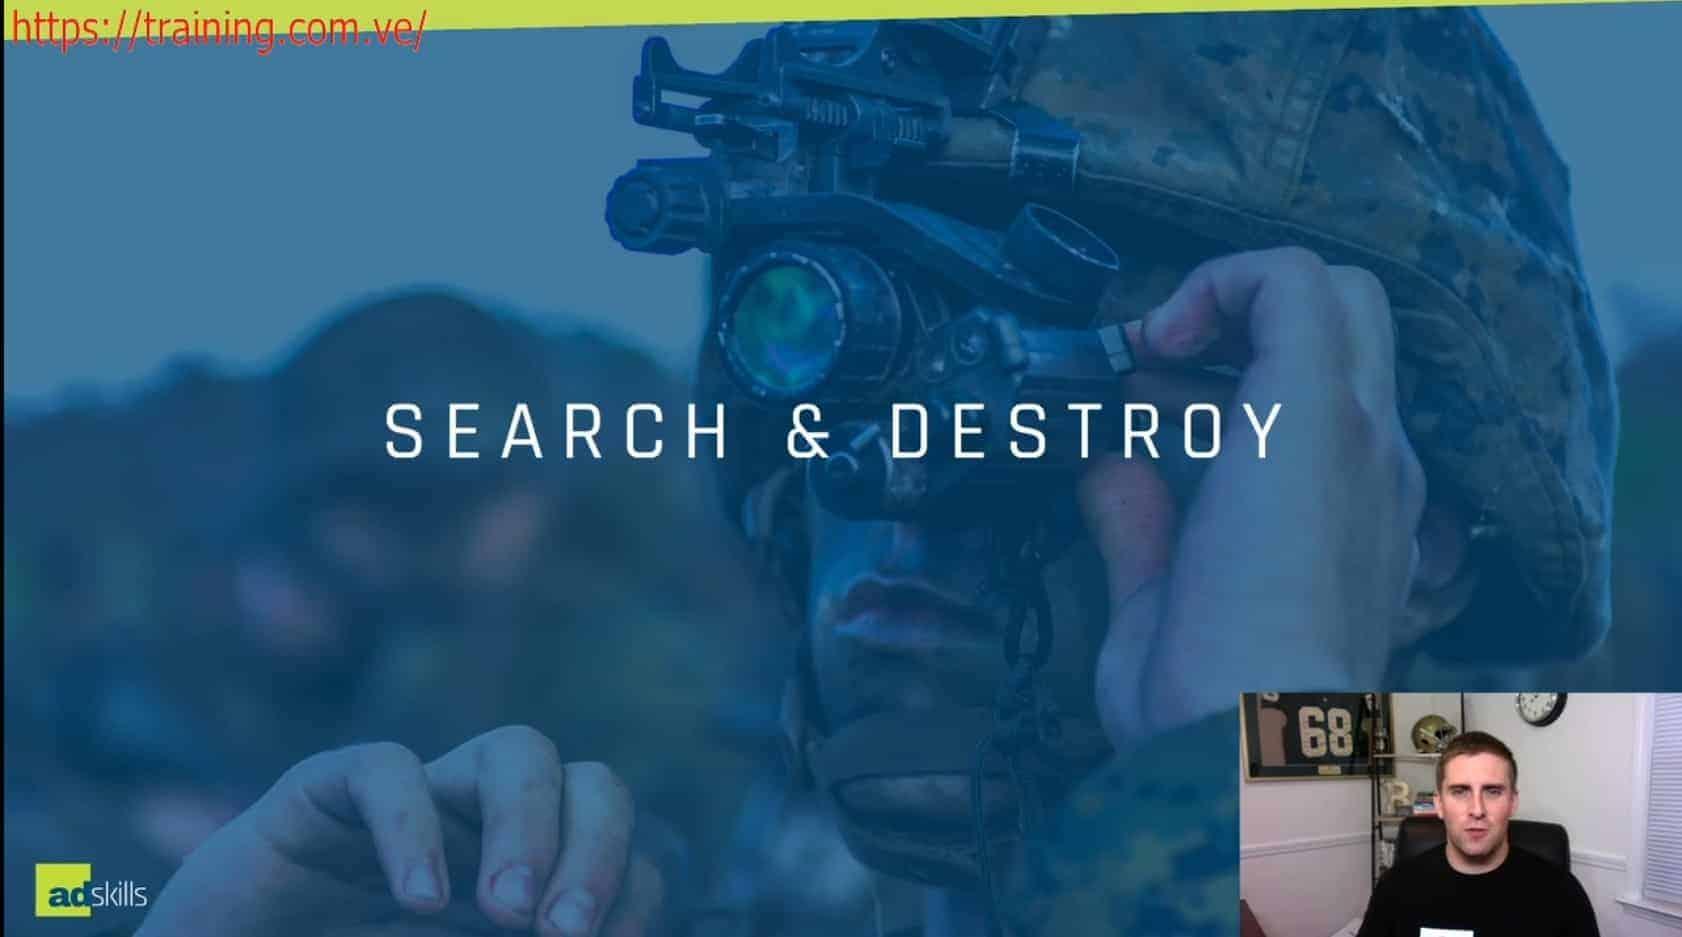 Search & Destroy Bootcamp by Justin Brooke John Belcher